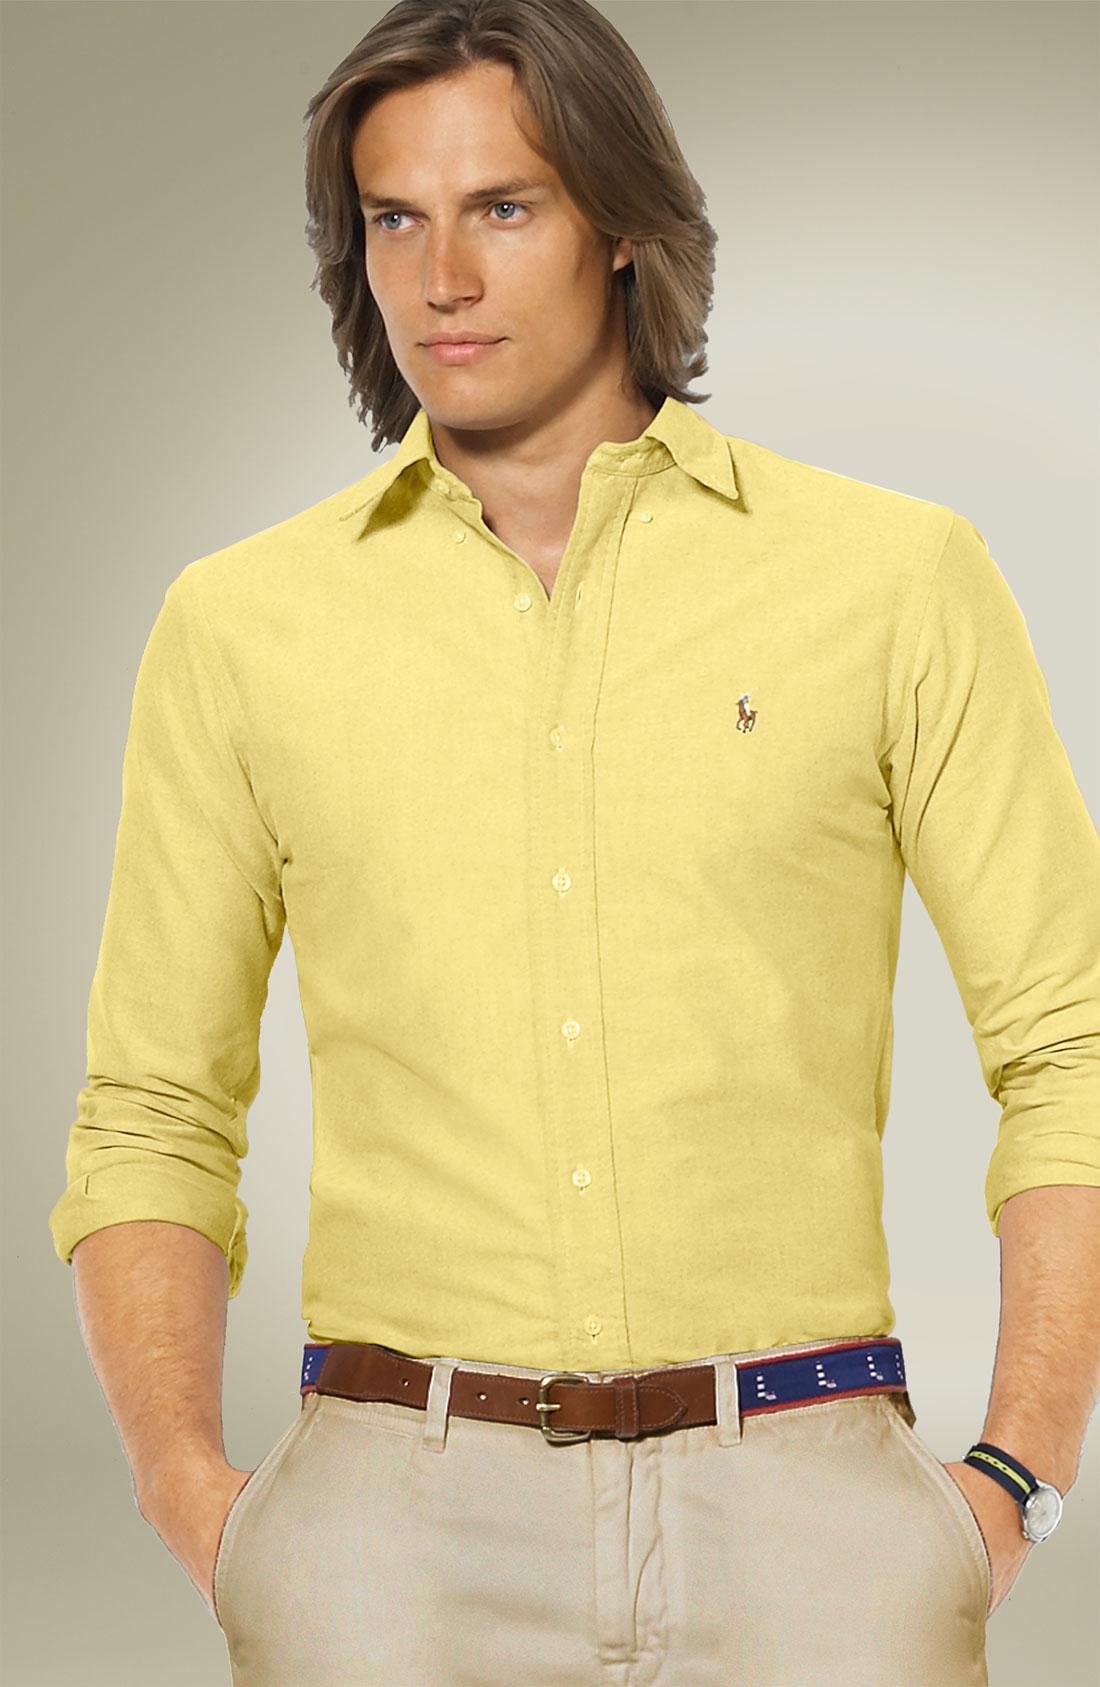 ralph lauren yellow oxford shirt w rtersee public relations